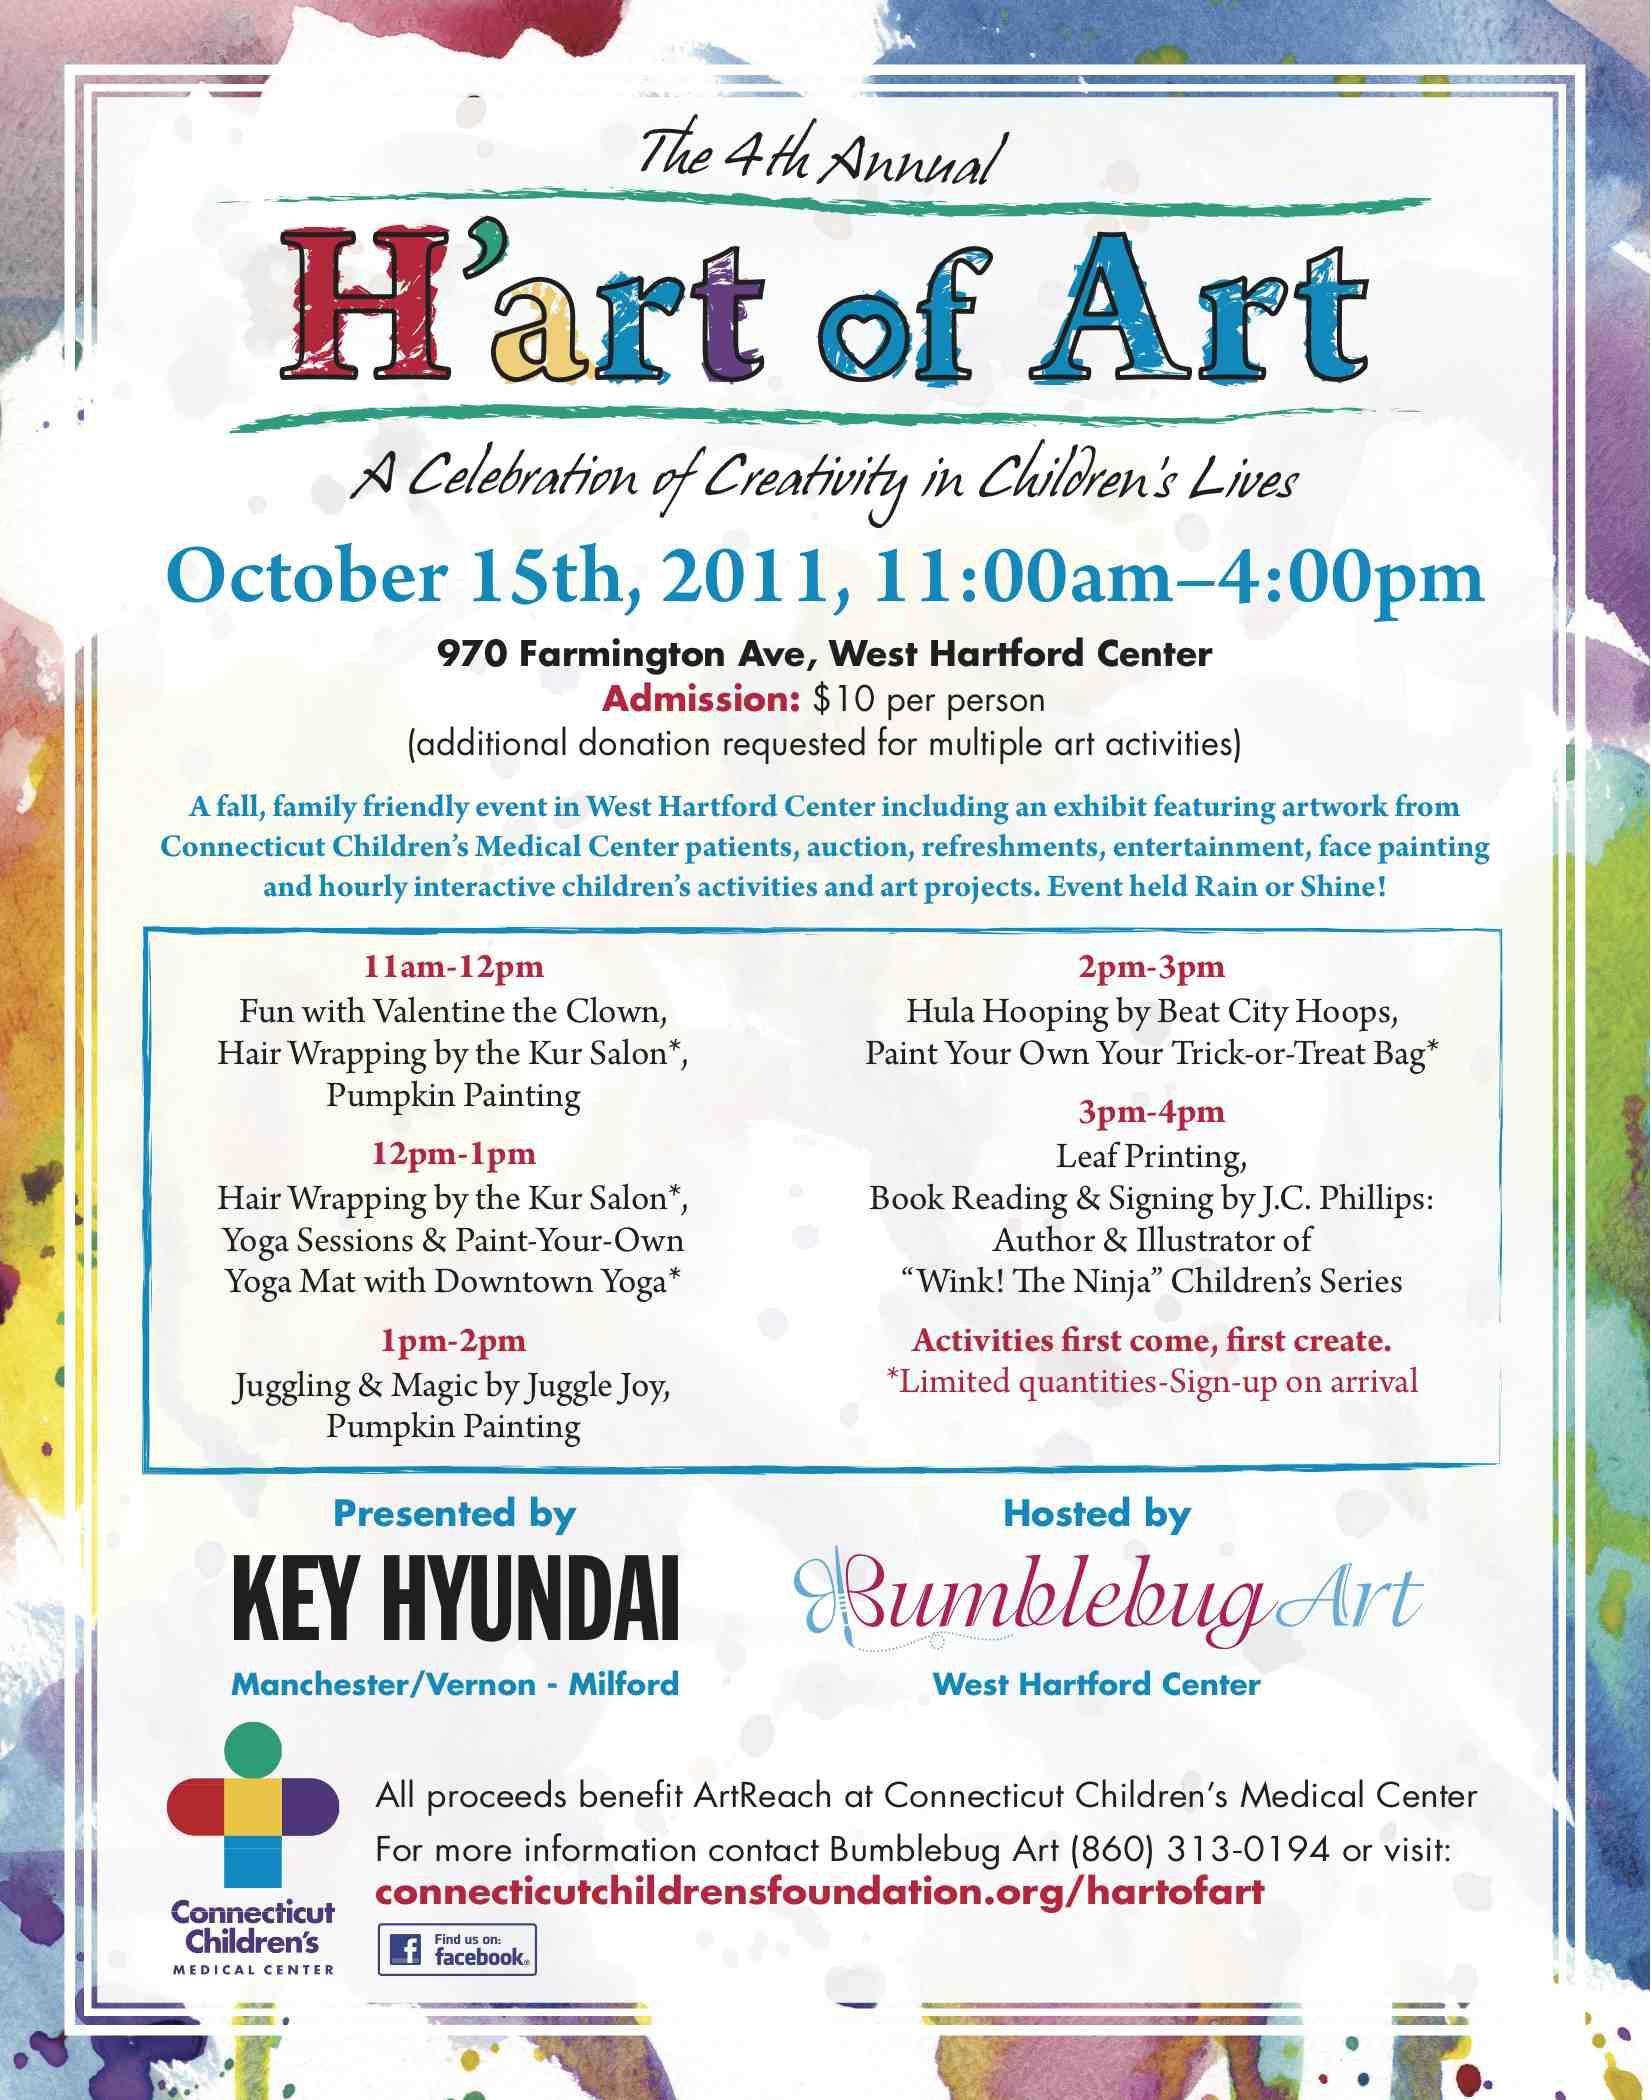 H'Art of Art & Connecticut Children's Medical Center & Key Hyundai